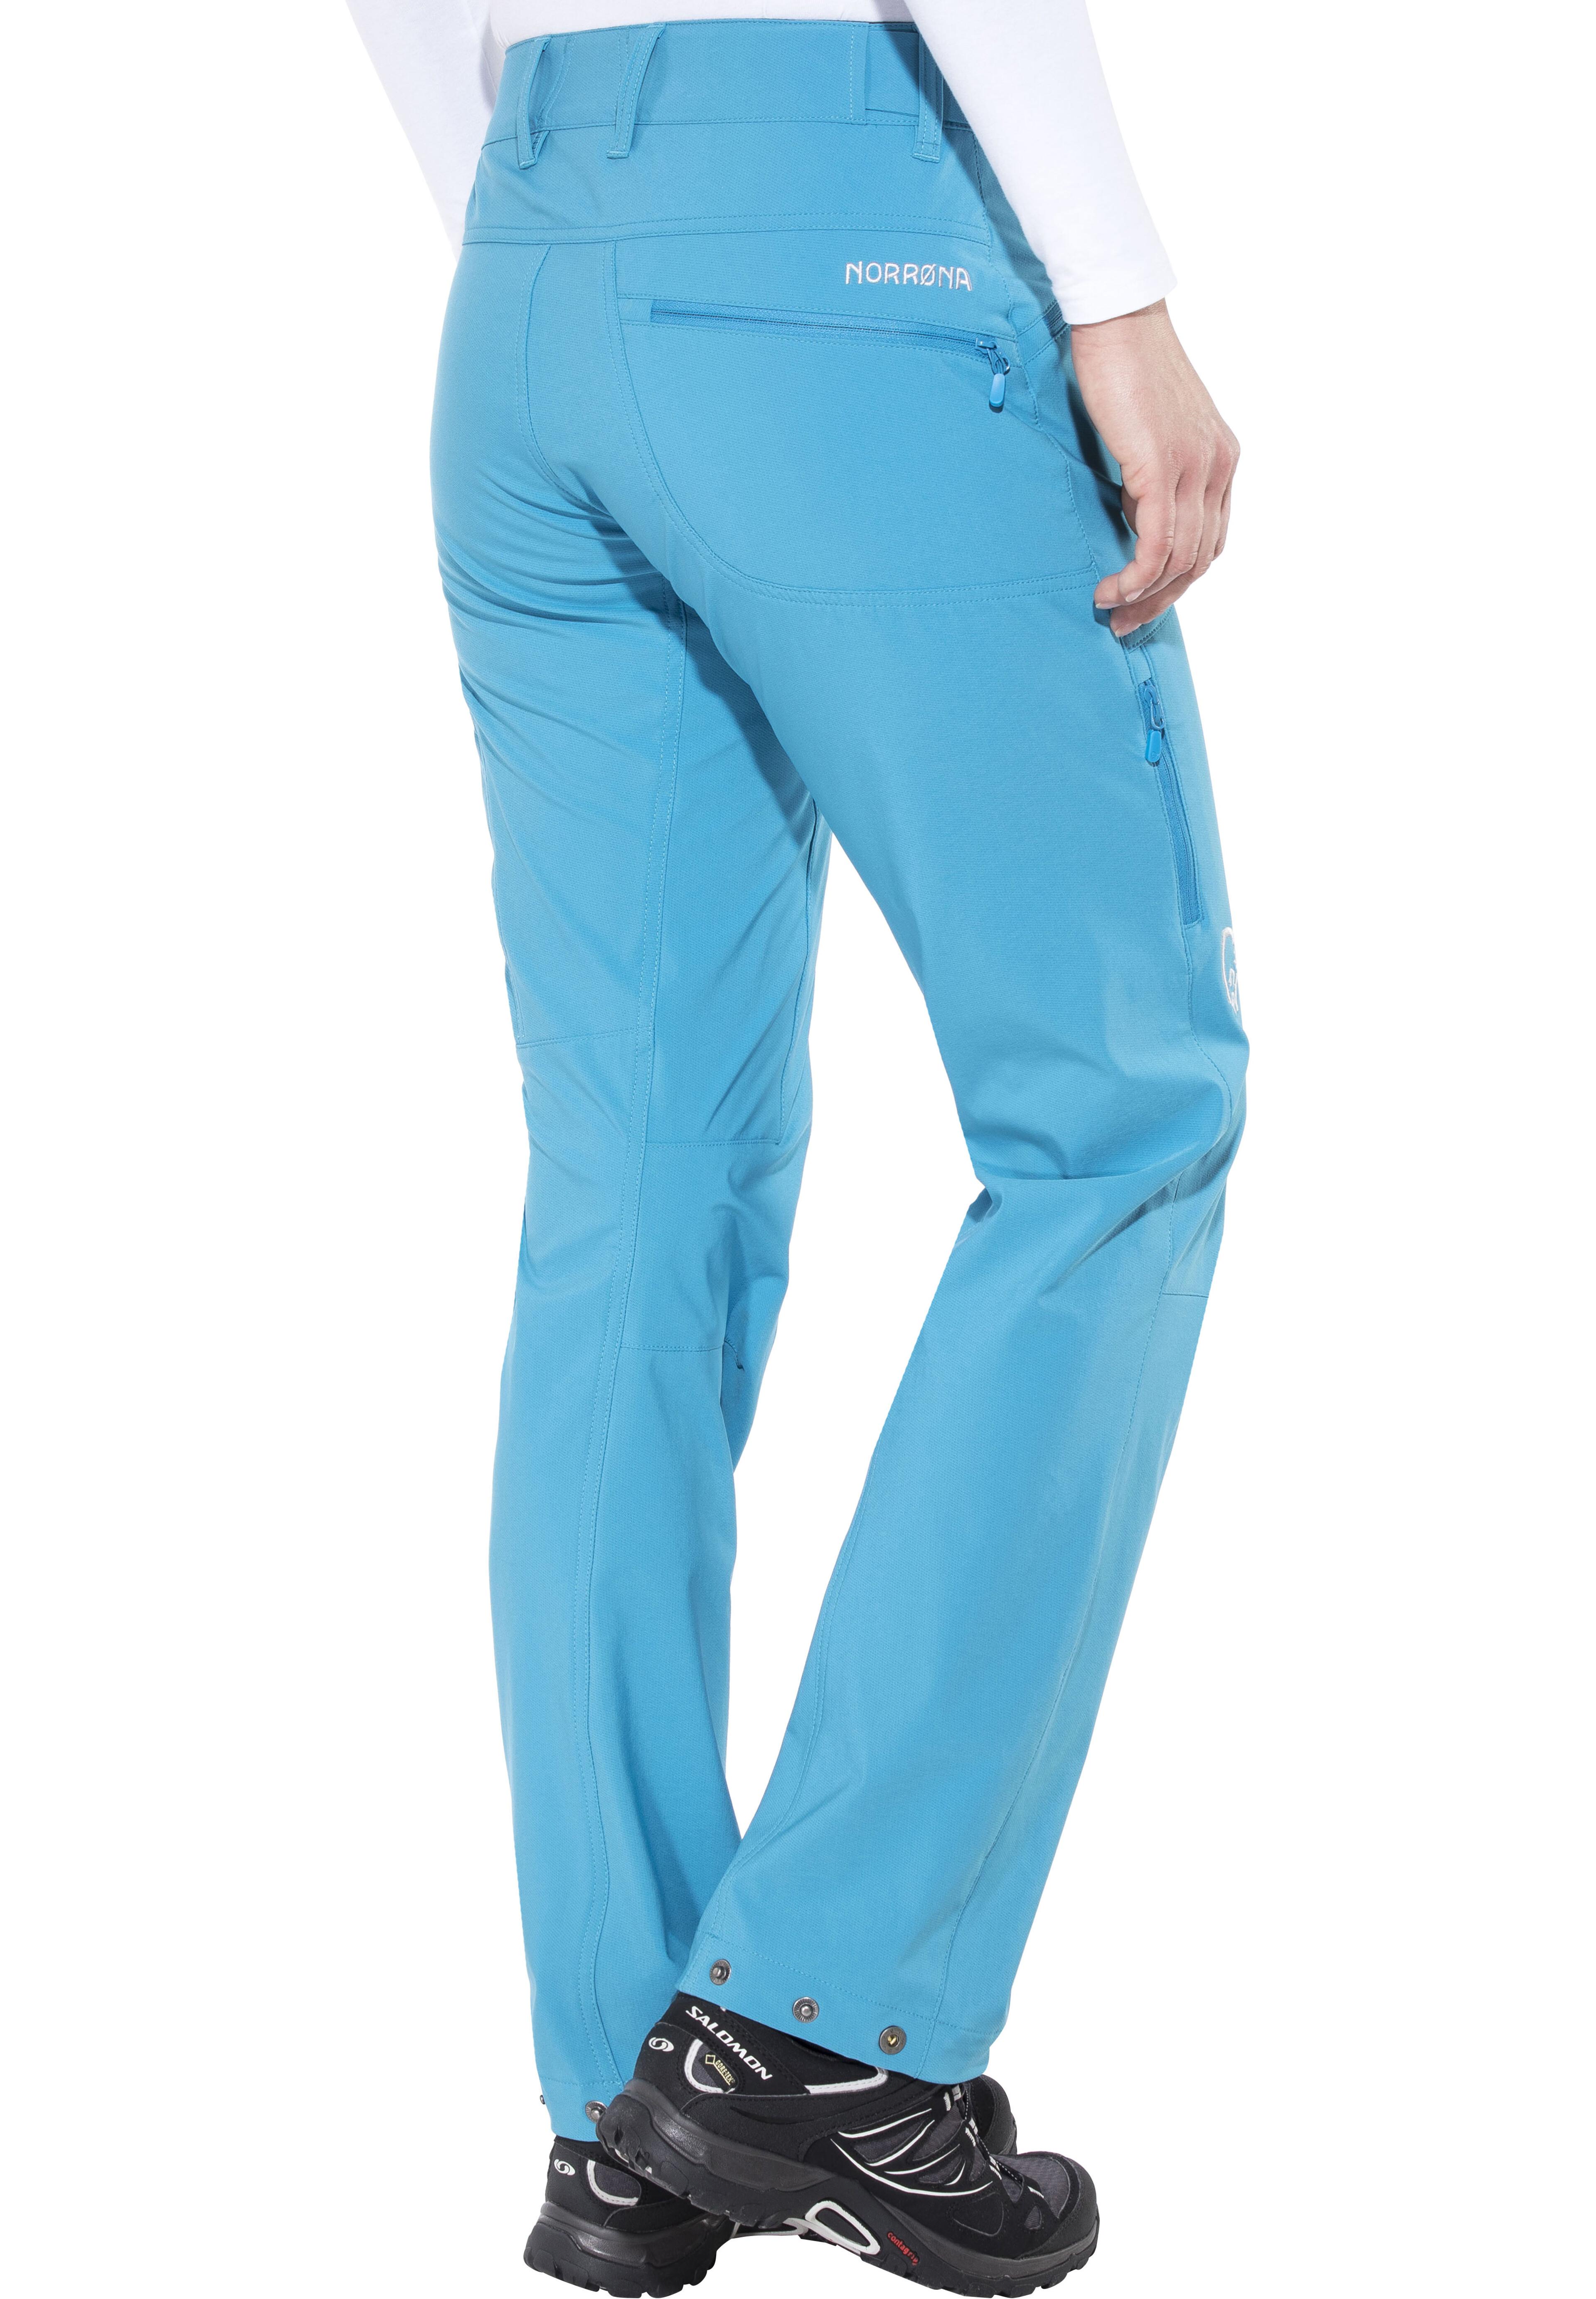 7e0f98398b0d76 Norrøna Falketind Flex1 Pants Women blue moon at Addnature.co.uk